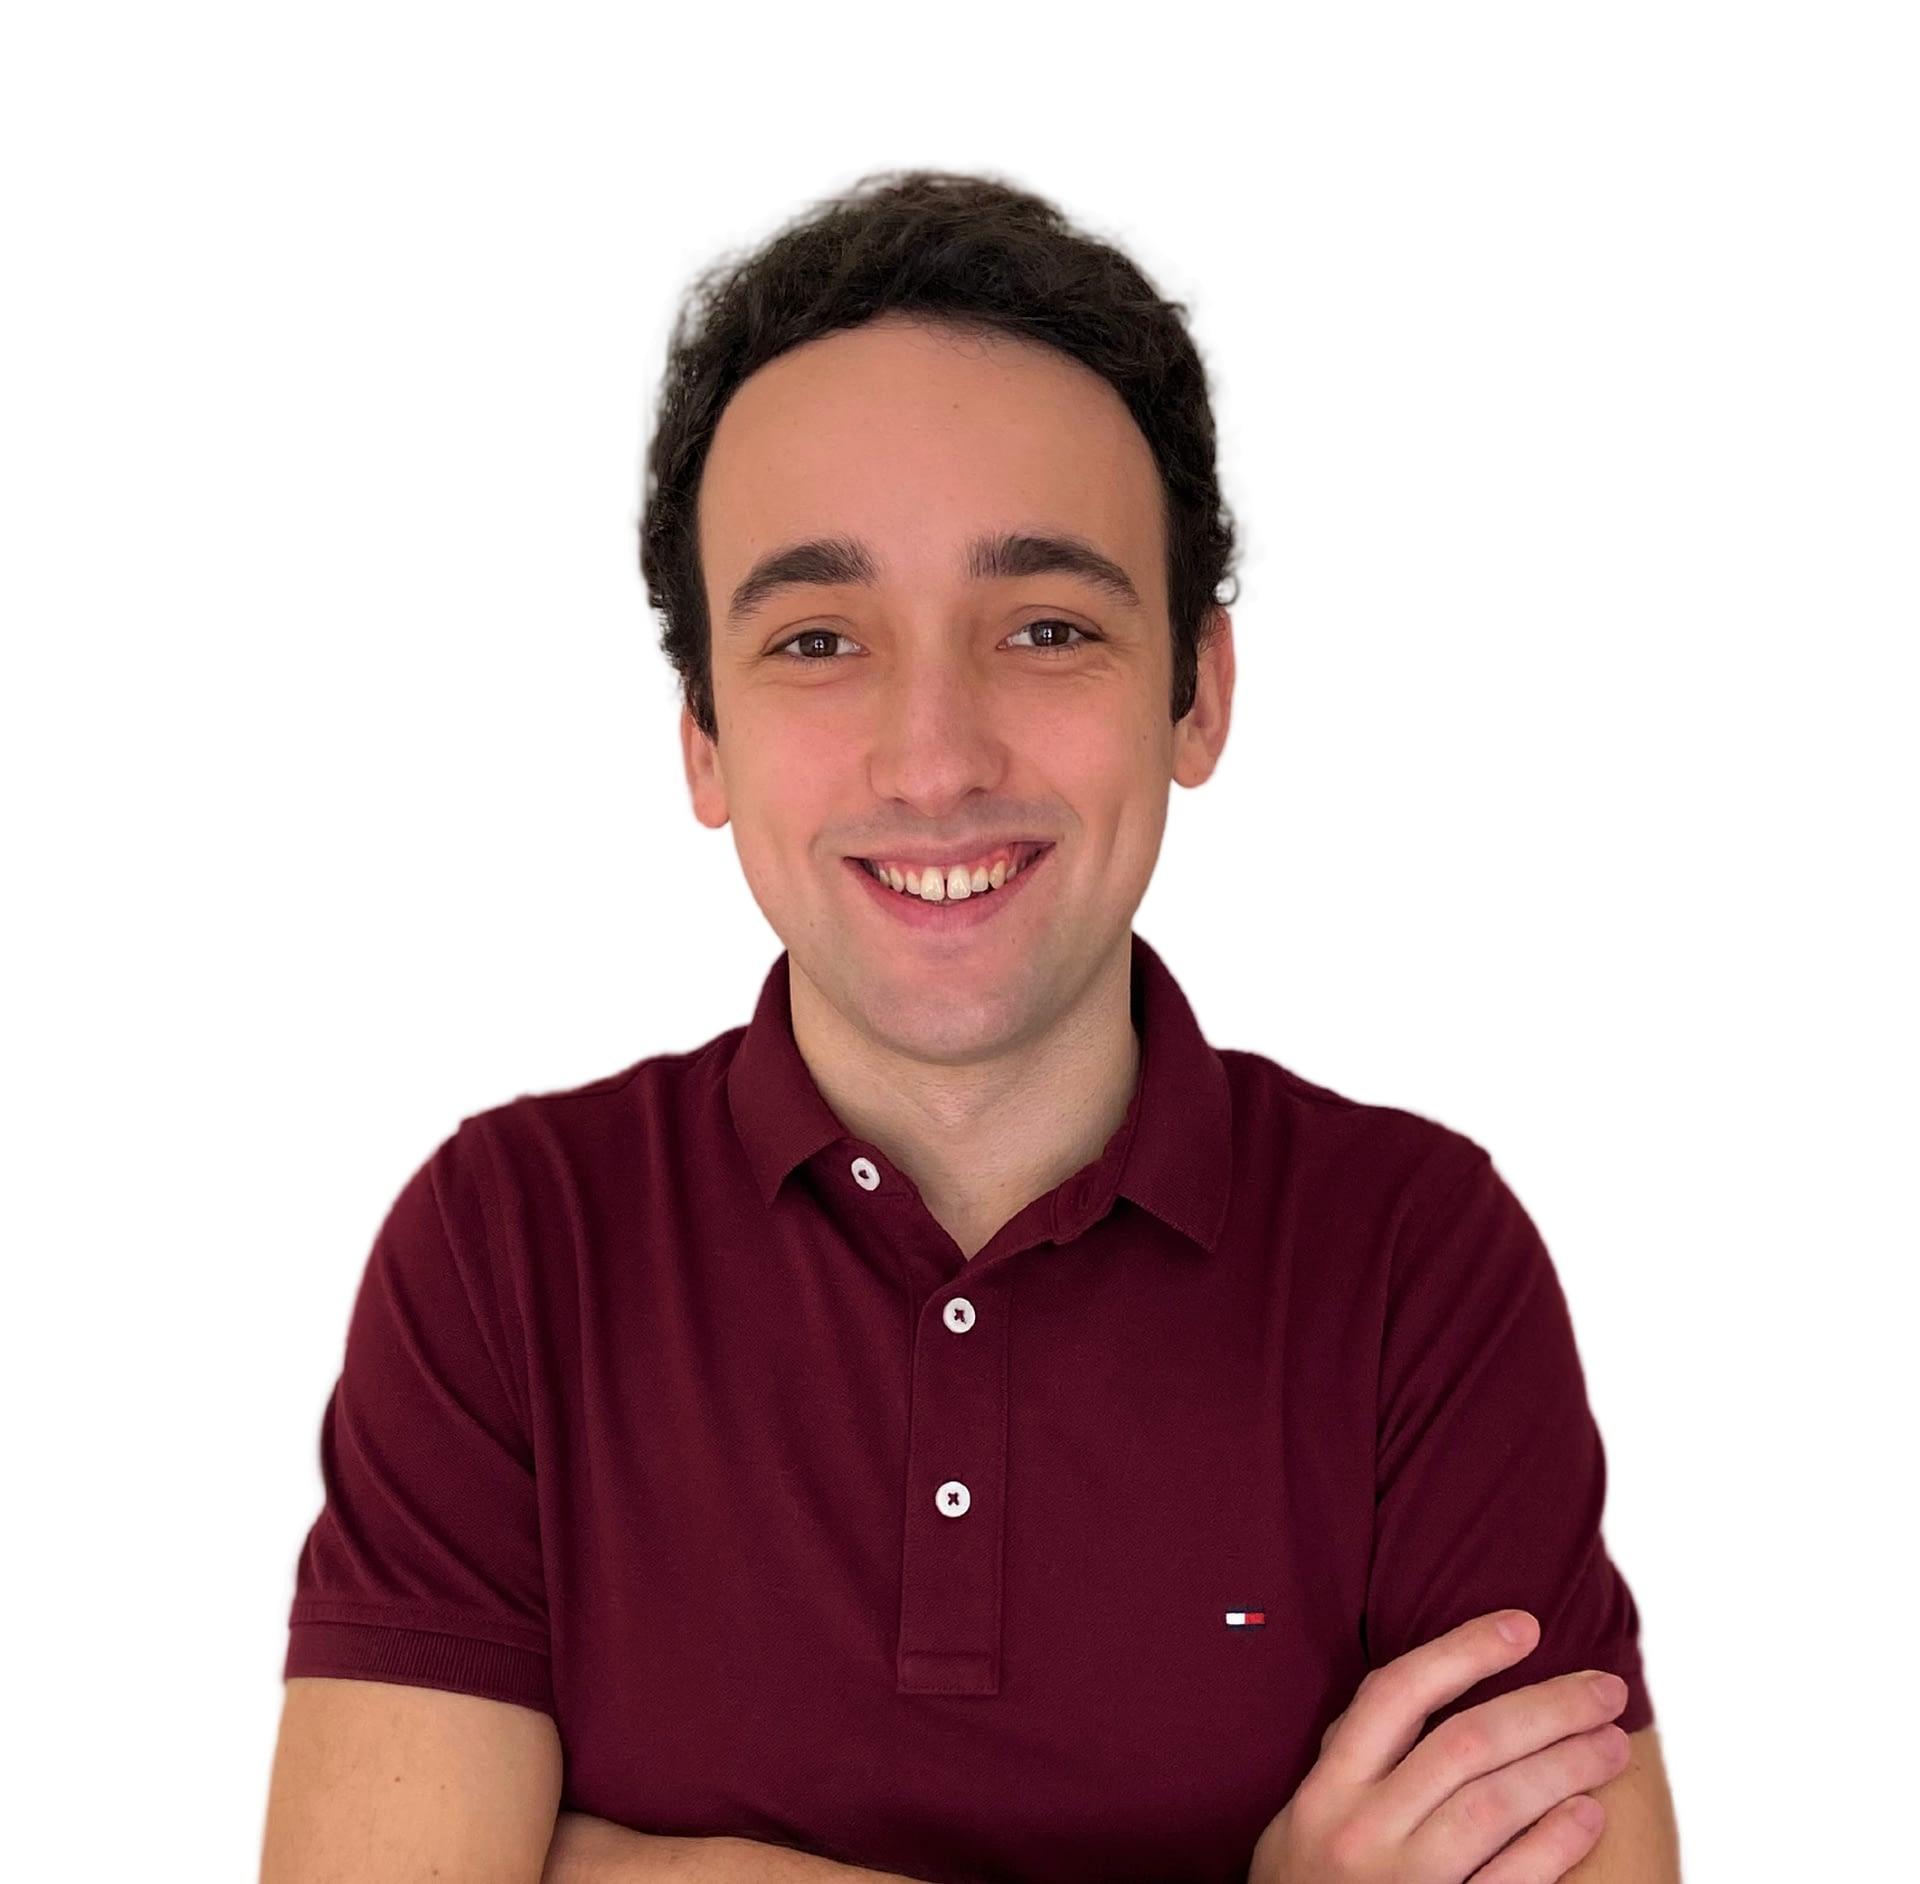 Aitor Ugarte